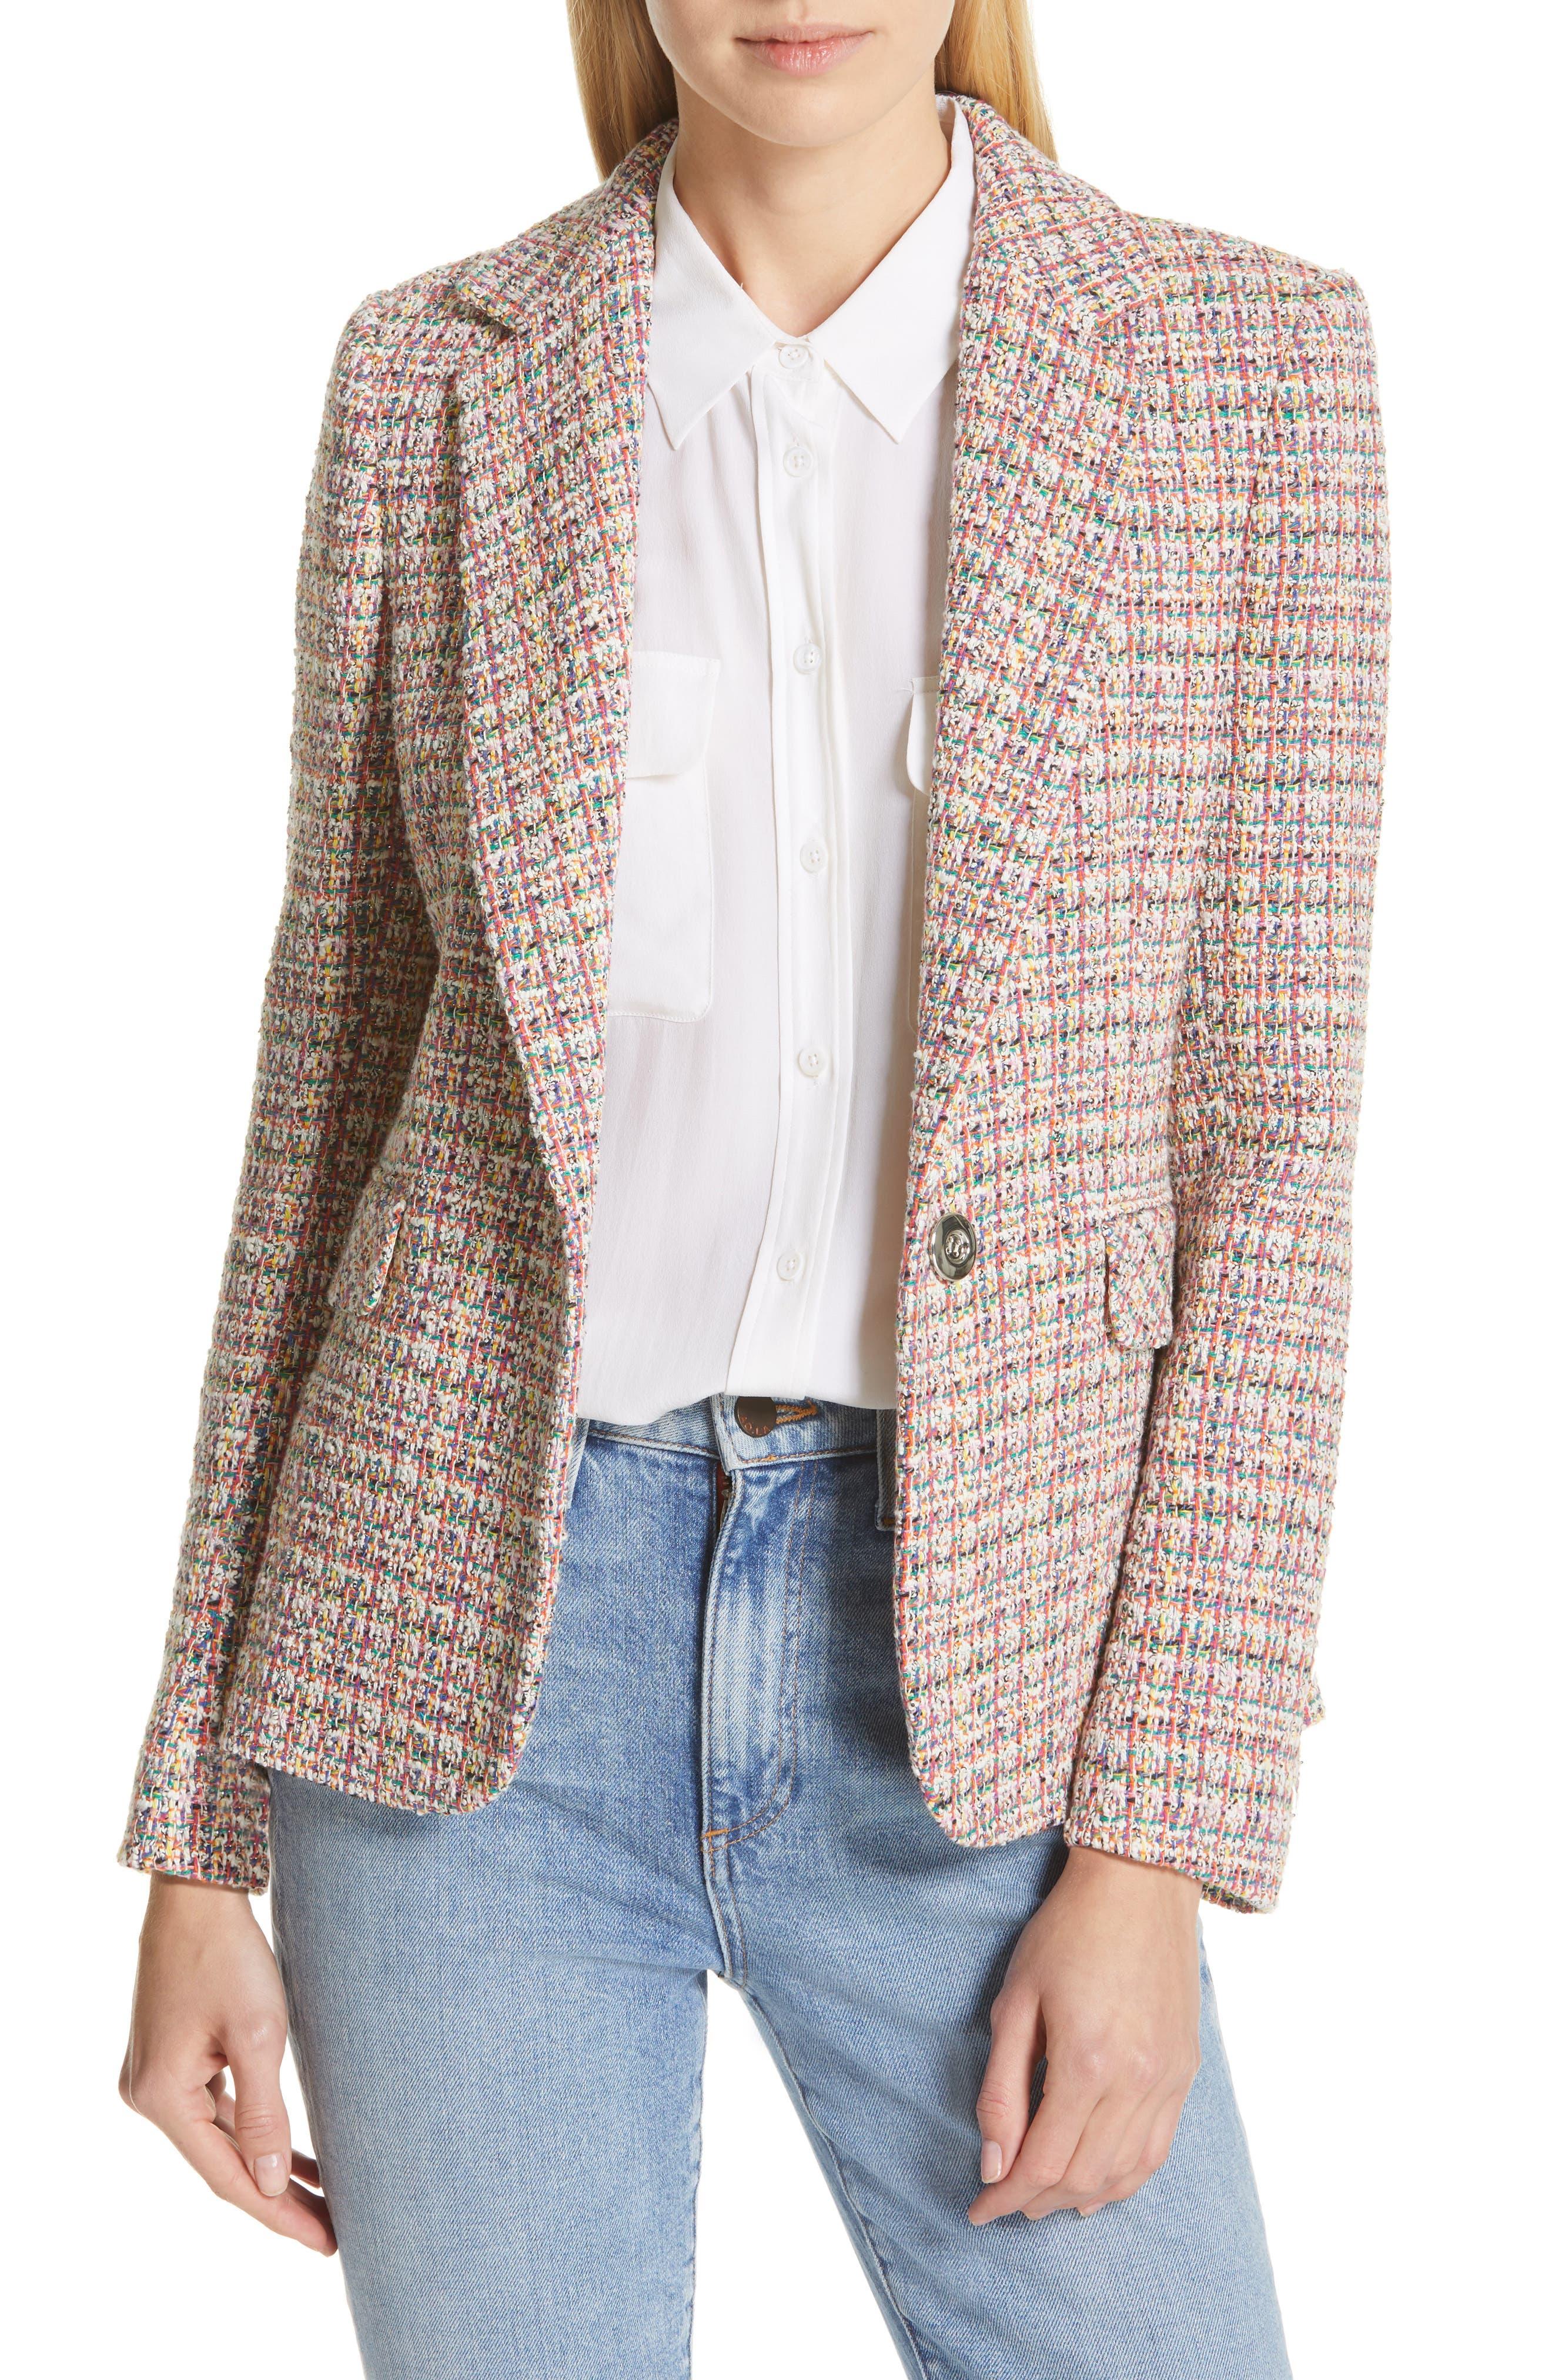 HELENE BERMAN, Colorful Tweed Blazer, Main thumbnail 1, color, ORANGE